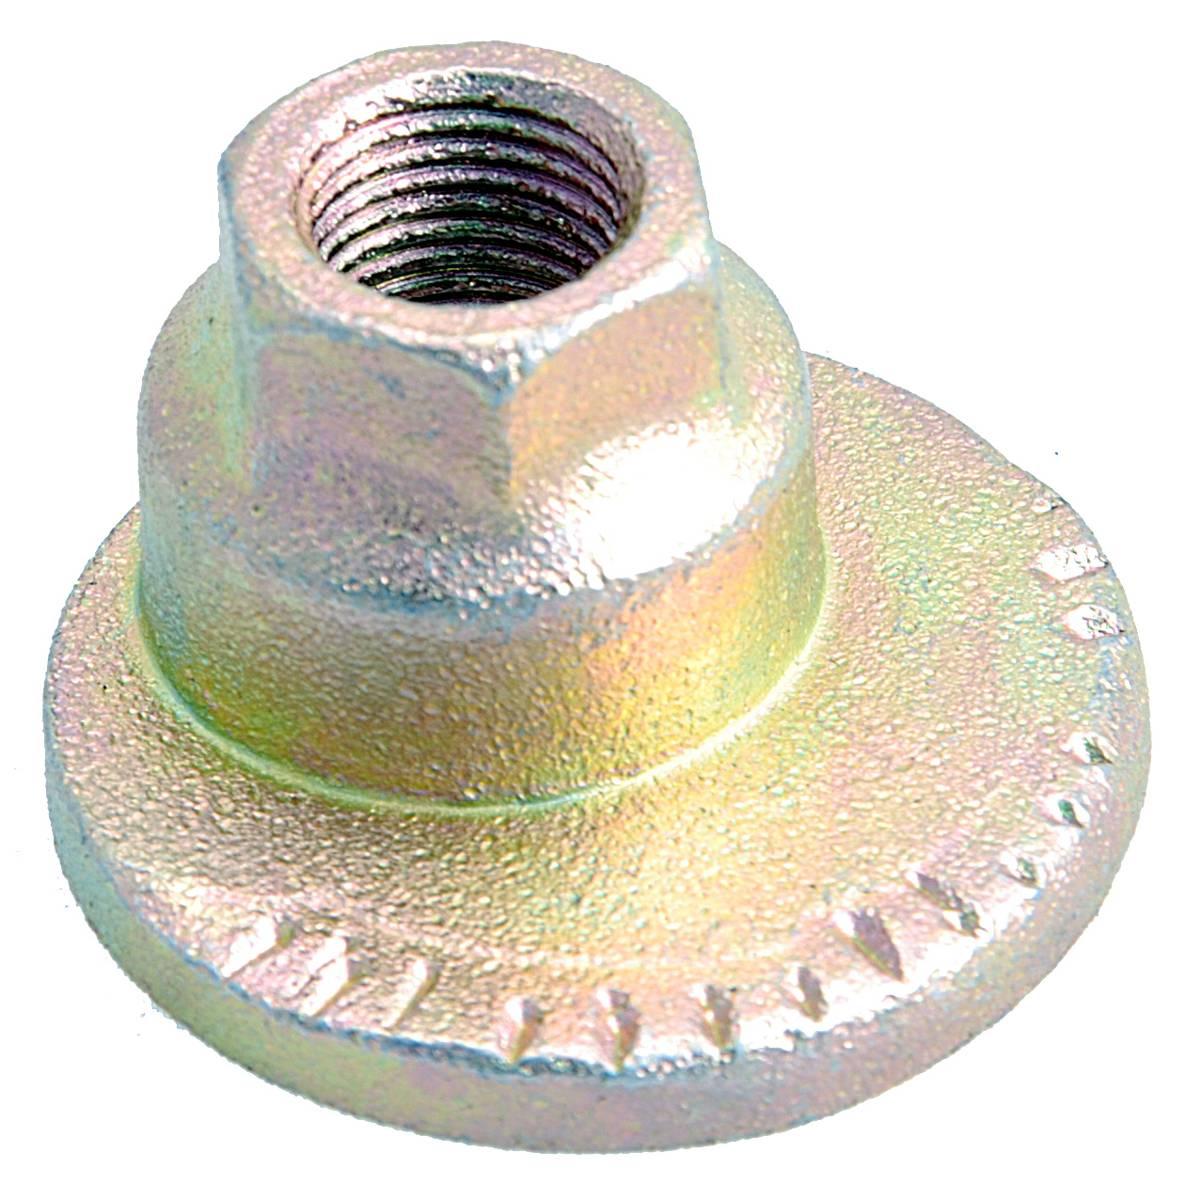 Febest 0131-001 PLATE, LEXUS RX300 MCU10 1998-2003,  OEM 48452-32030